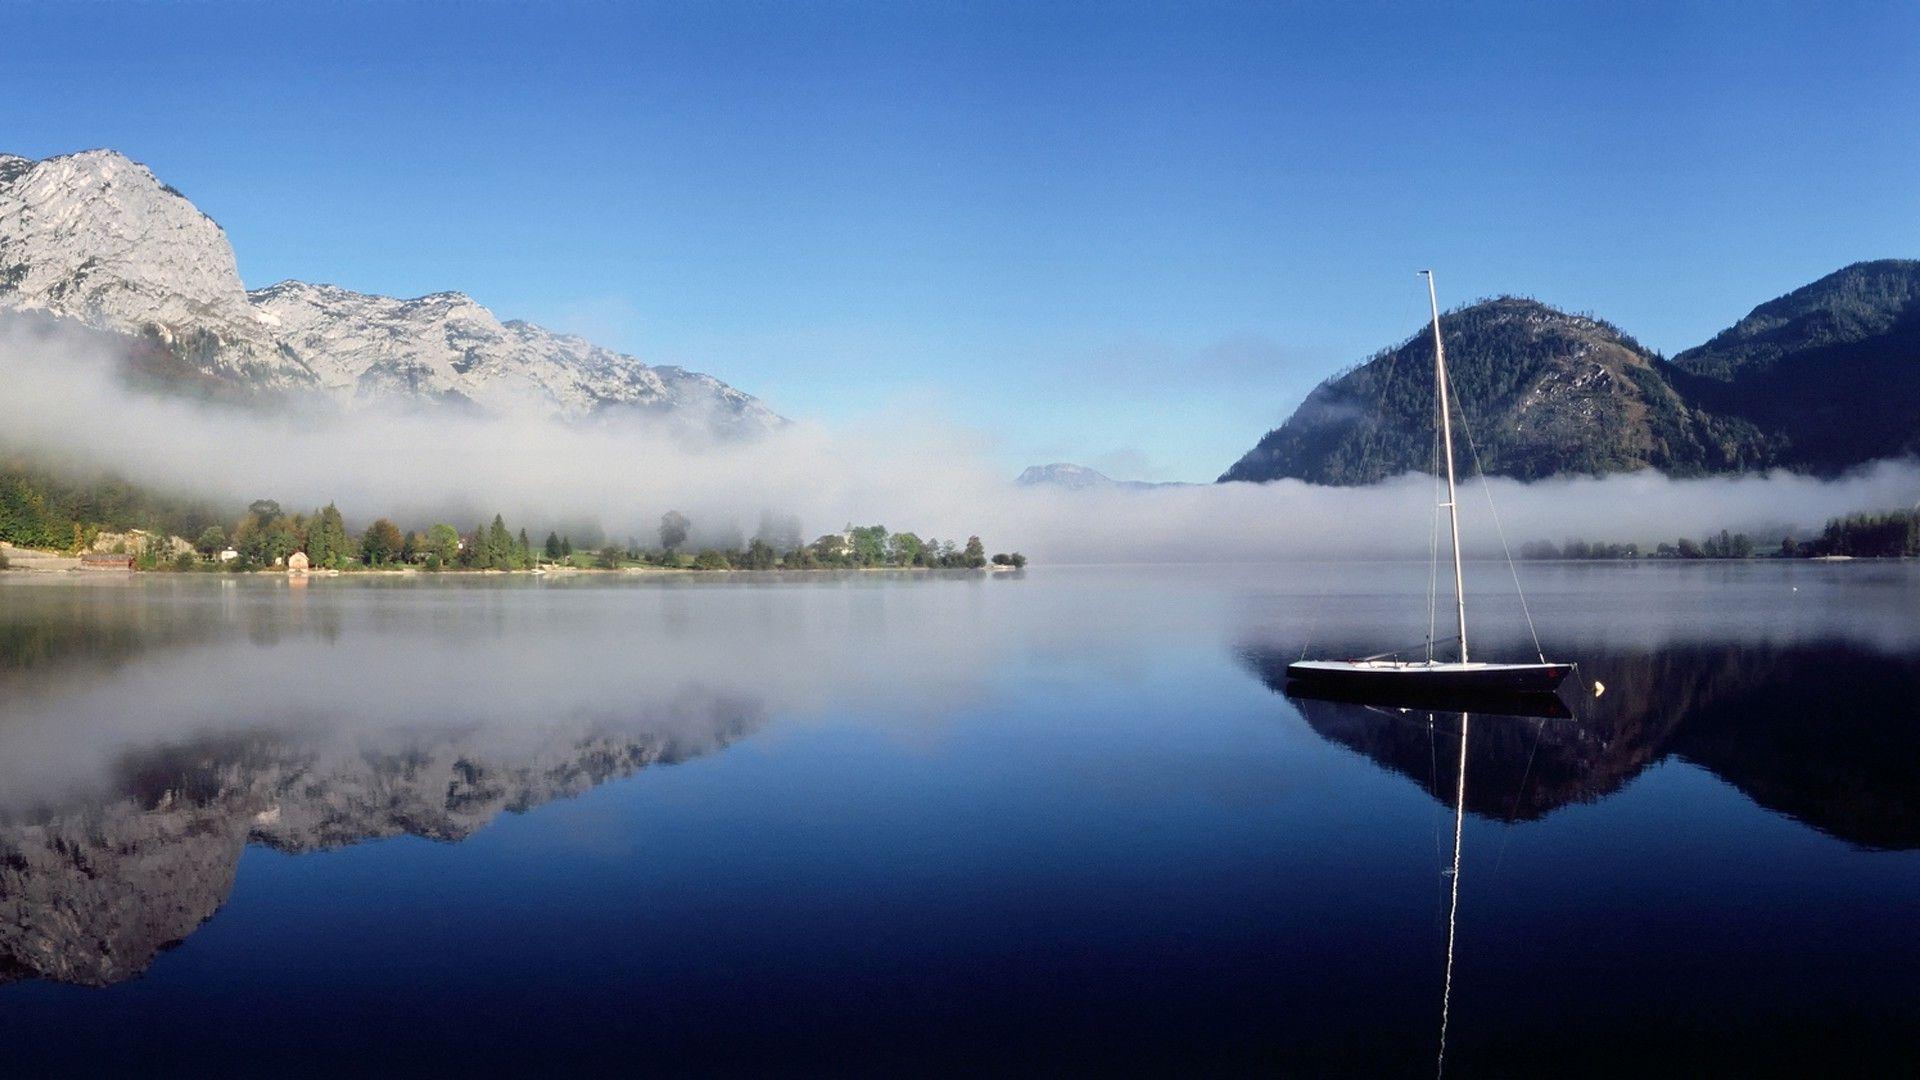 Mountain Reflection In Water HD desktop wallpaper Widescreen